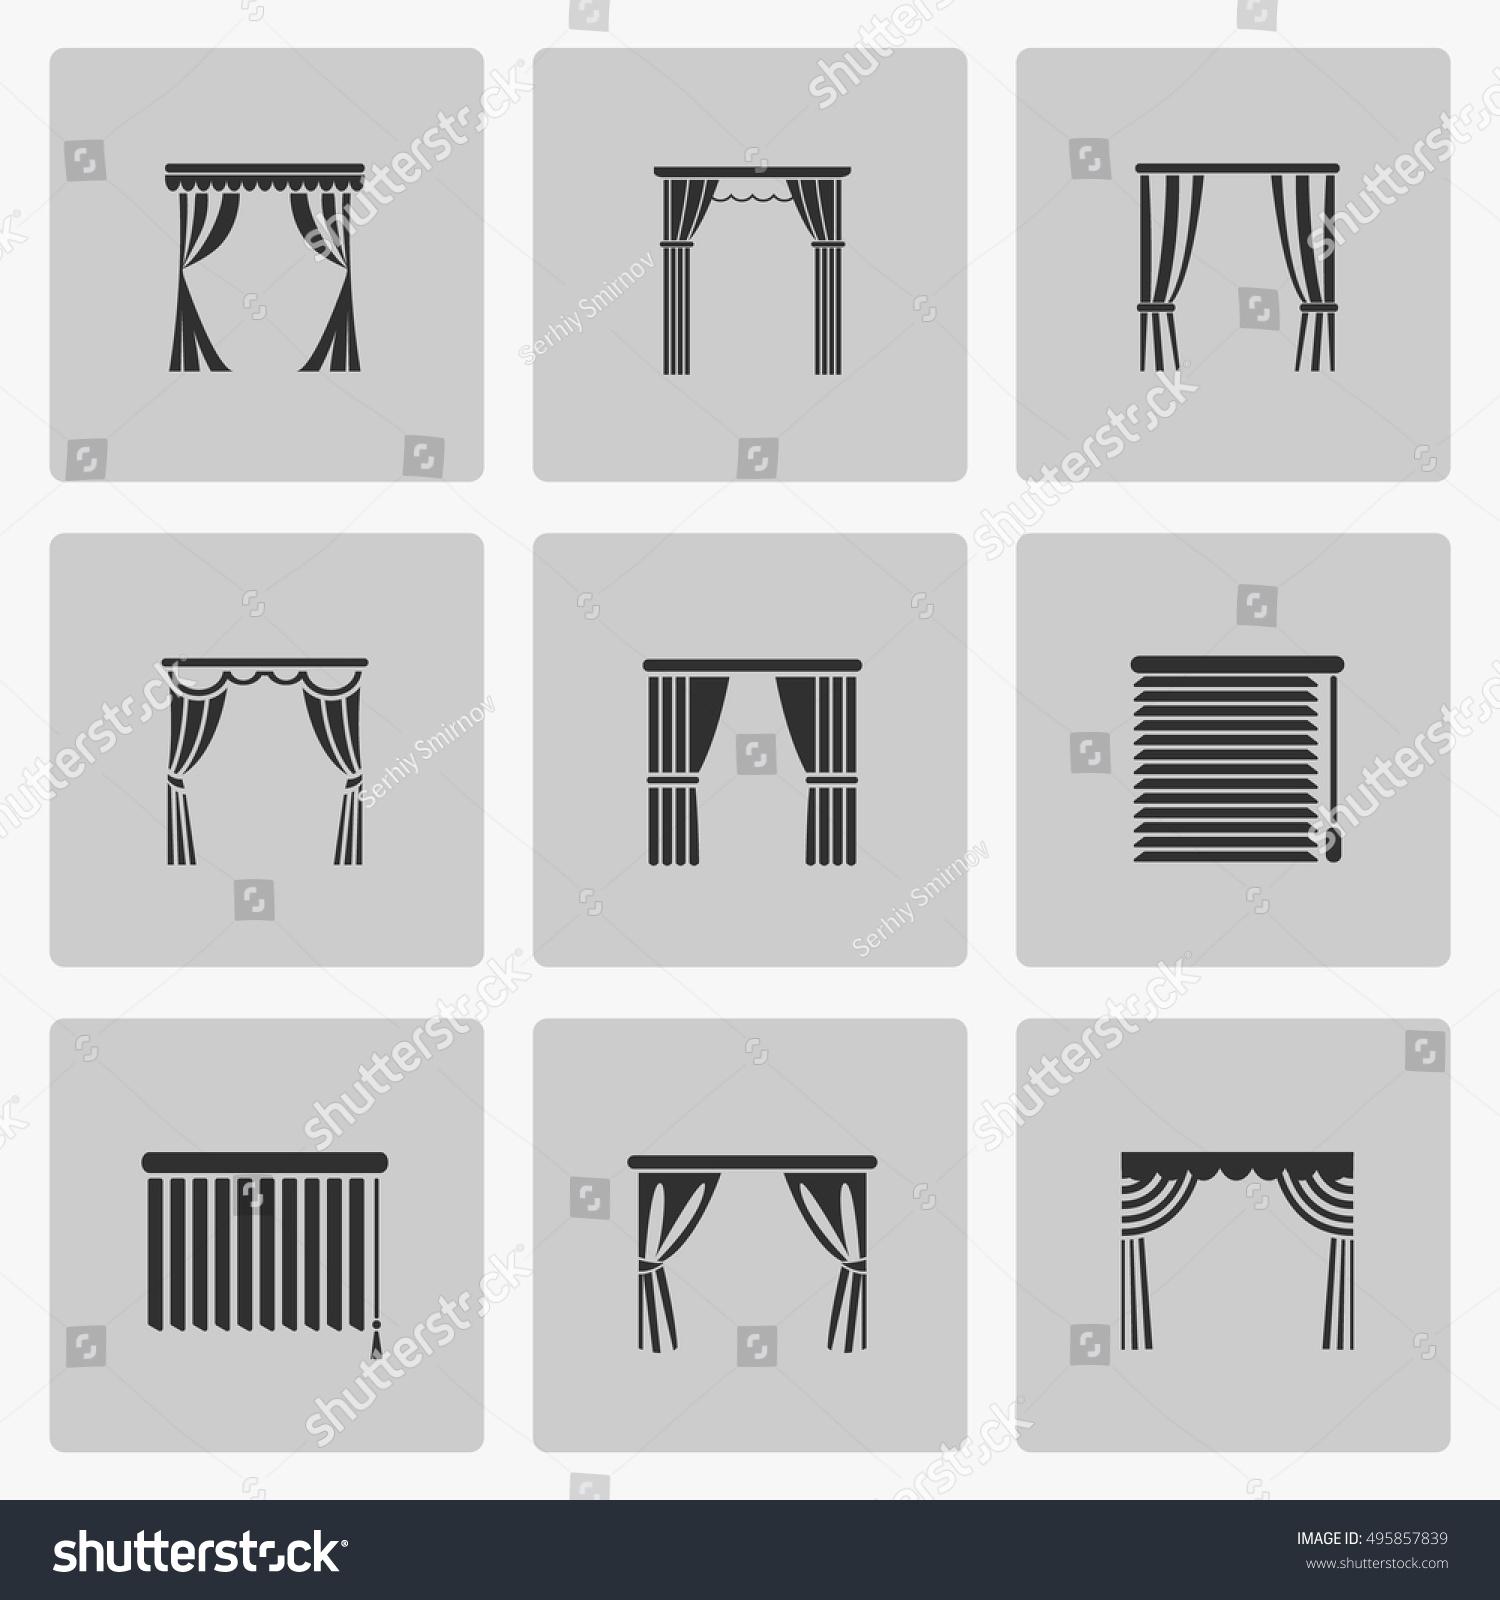 window blinds jalousie symbol window draperies stock vector 495857839 shutterstock. Black Bedroom Furniture Sets. Home Design Ideas